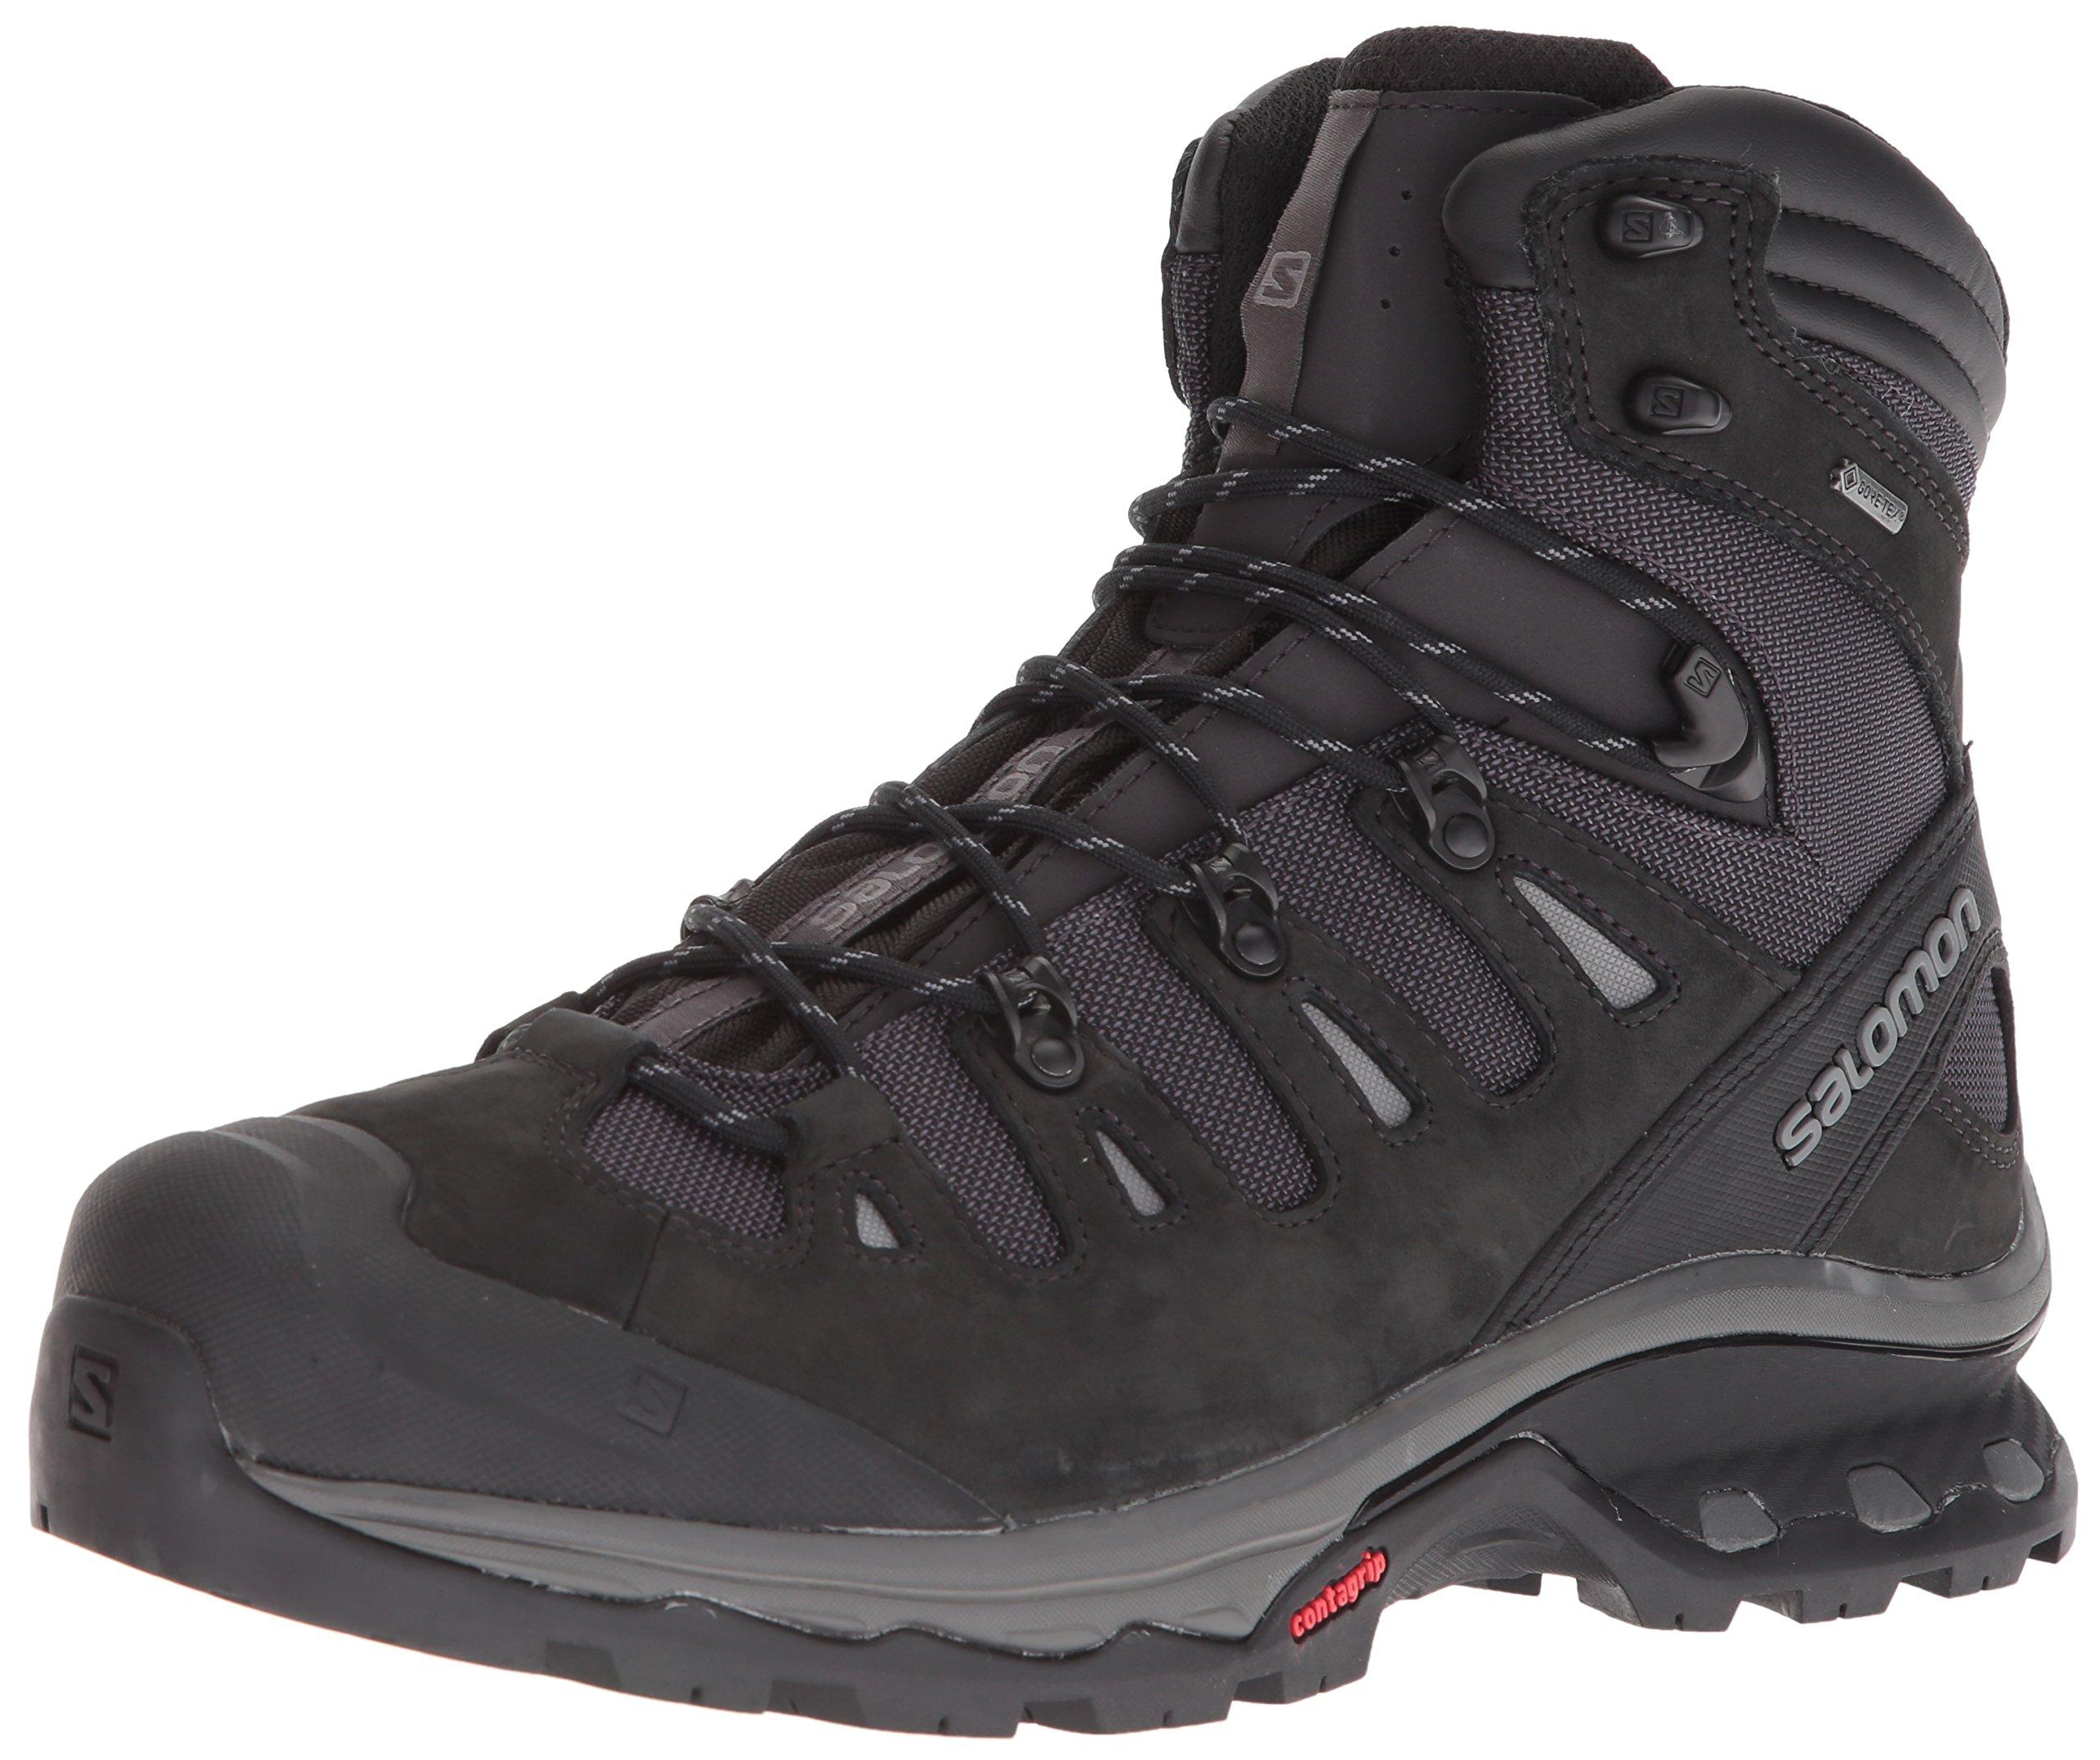 Salomon Men's Quest 4D 3 GTX Backpacking Boots, Phantom/Black, 10 M US